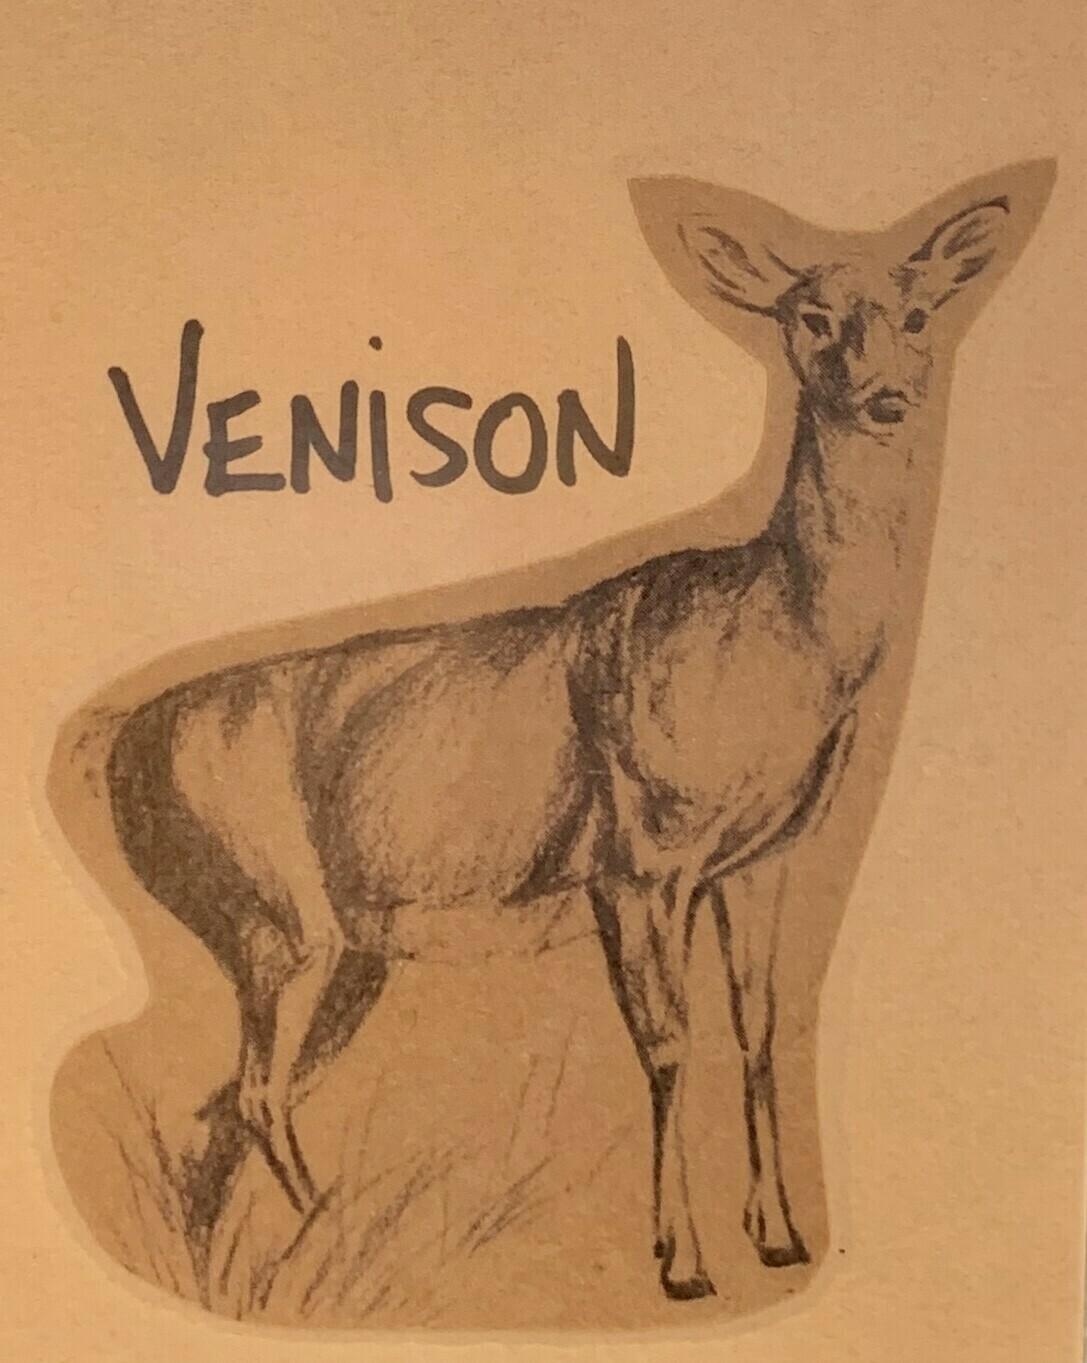 venison, ground, 1 pound pack; Shaffer Farm